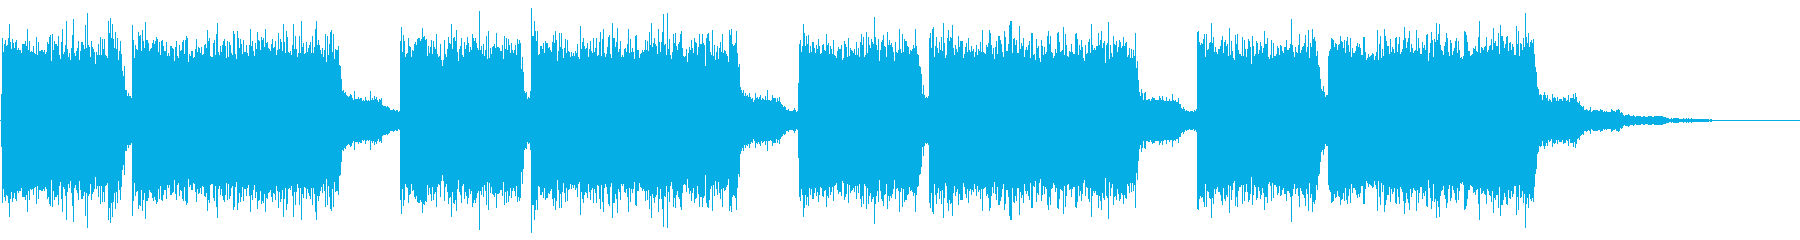 KANT近未来映画アニメ的アラーム音3の再生済みの波形